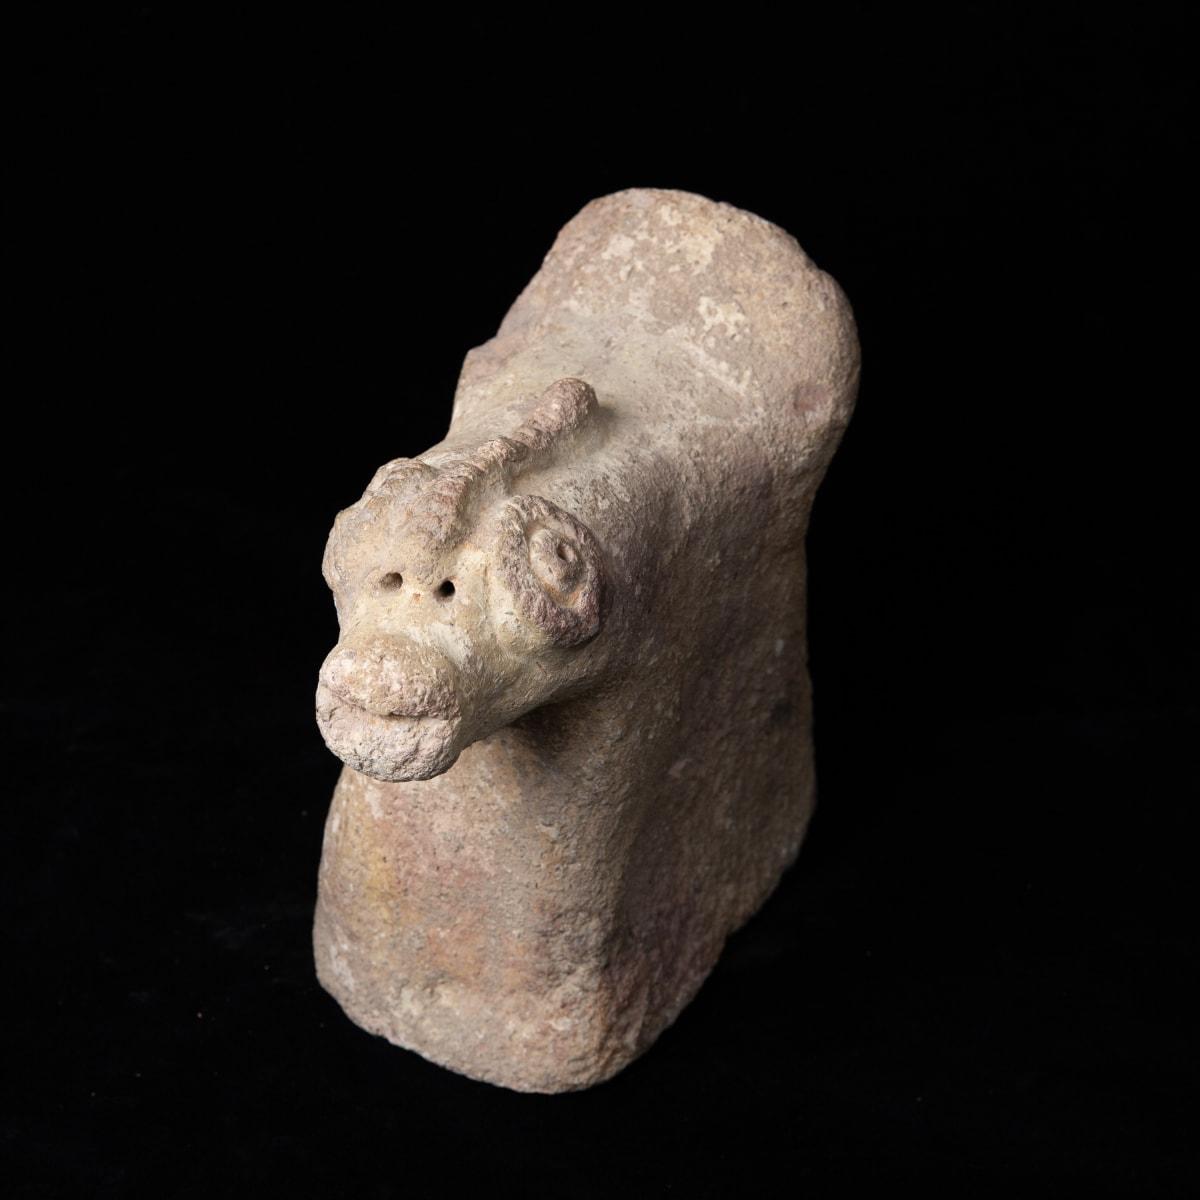 Syro Hittite Ram, 2500-1500 BC Terracotta 20 x 23 x 10 cm 7 7/8 x 9 1/8 x 4 in